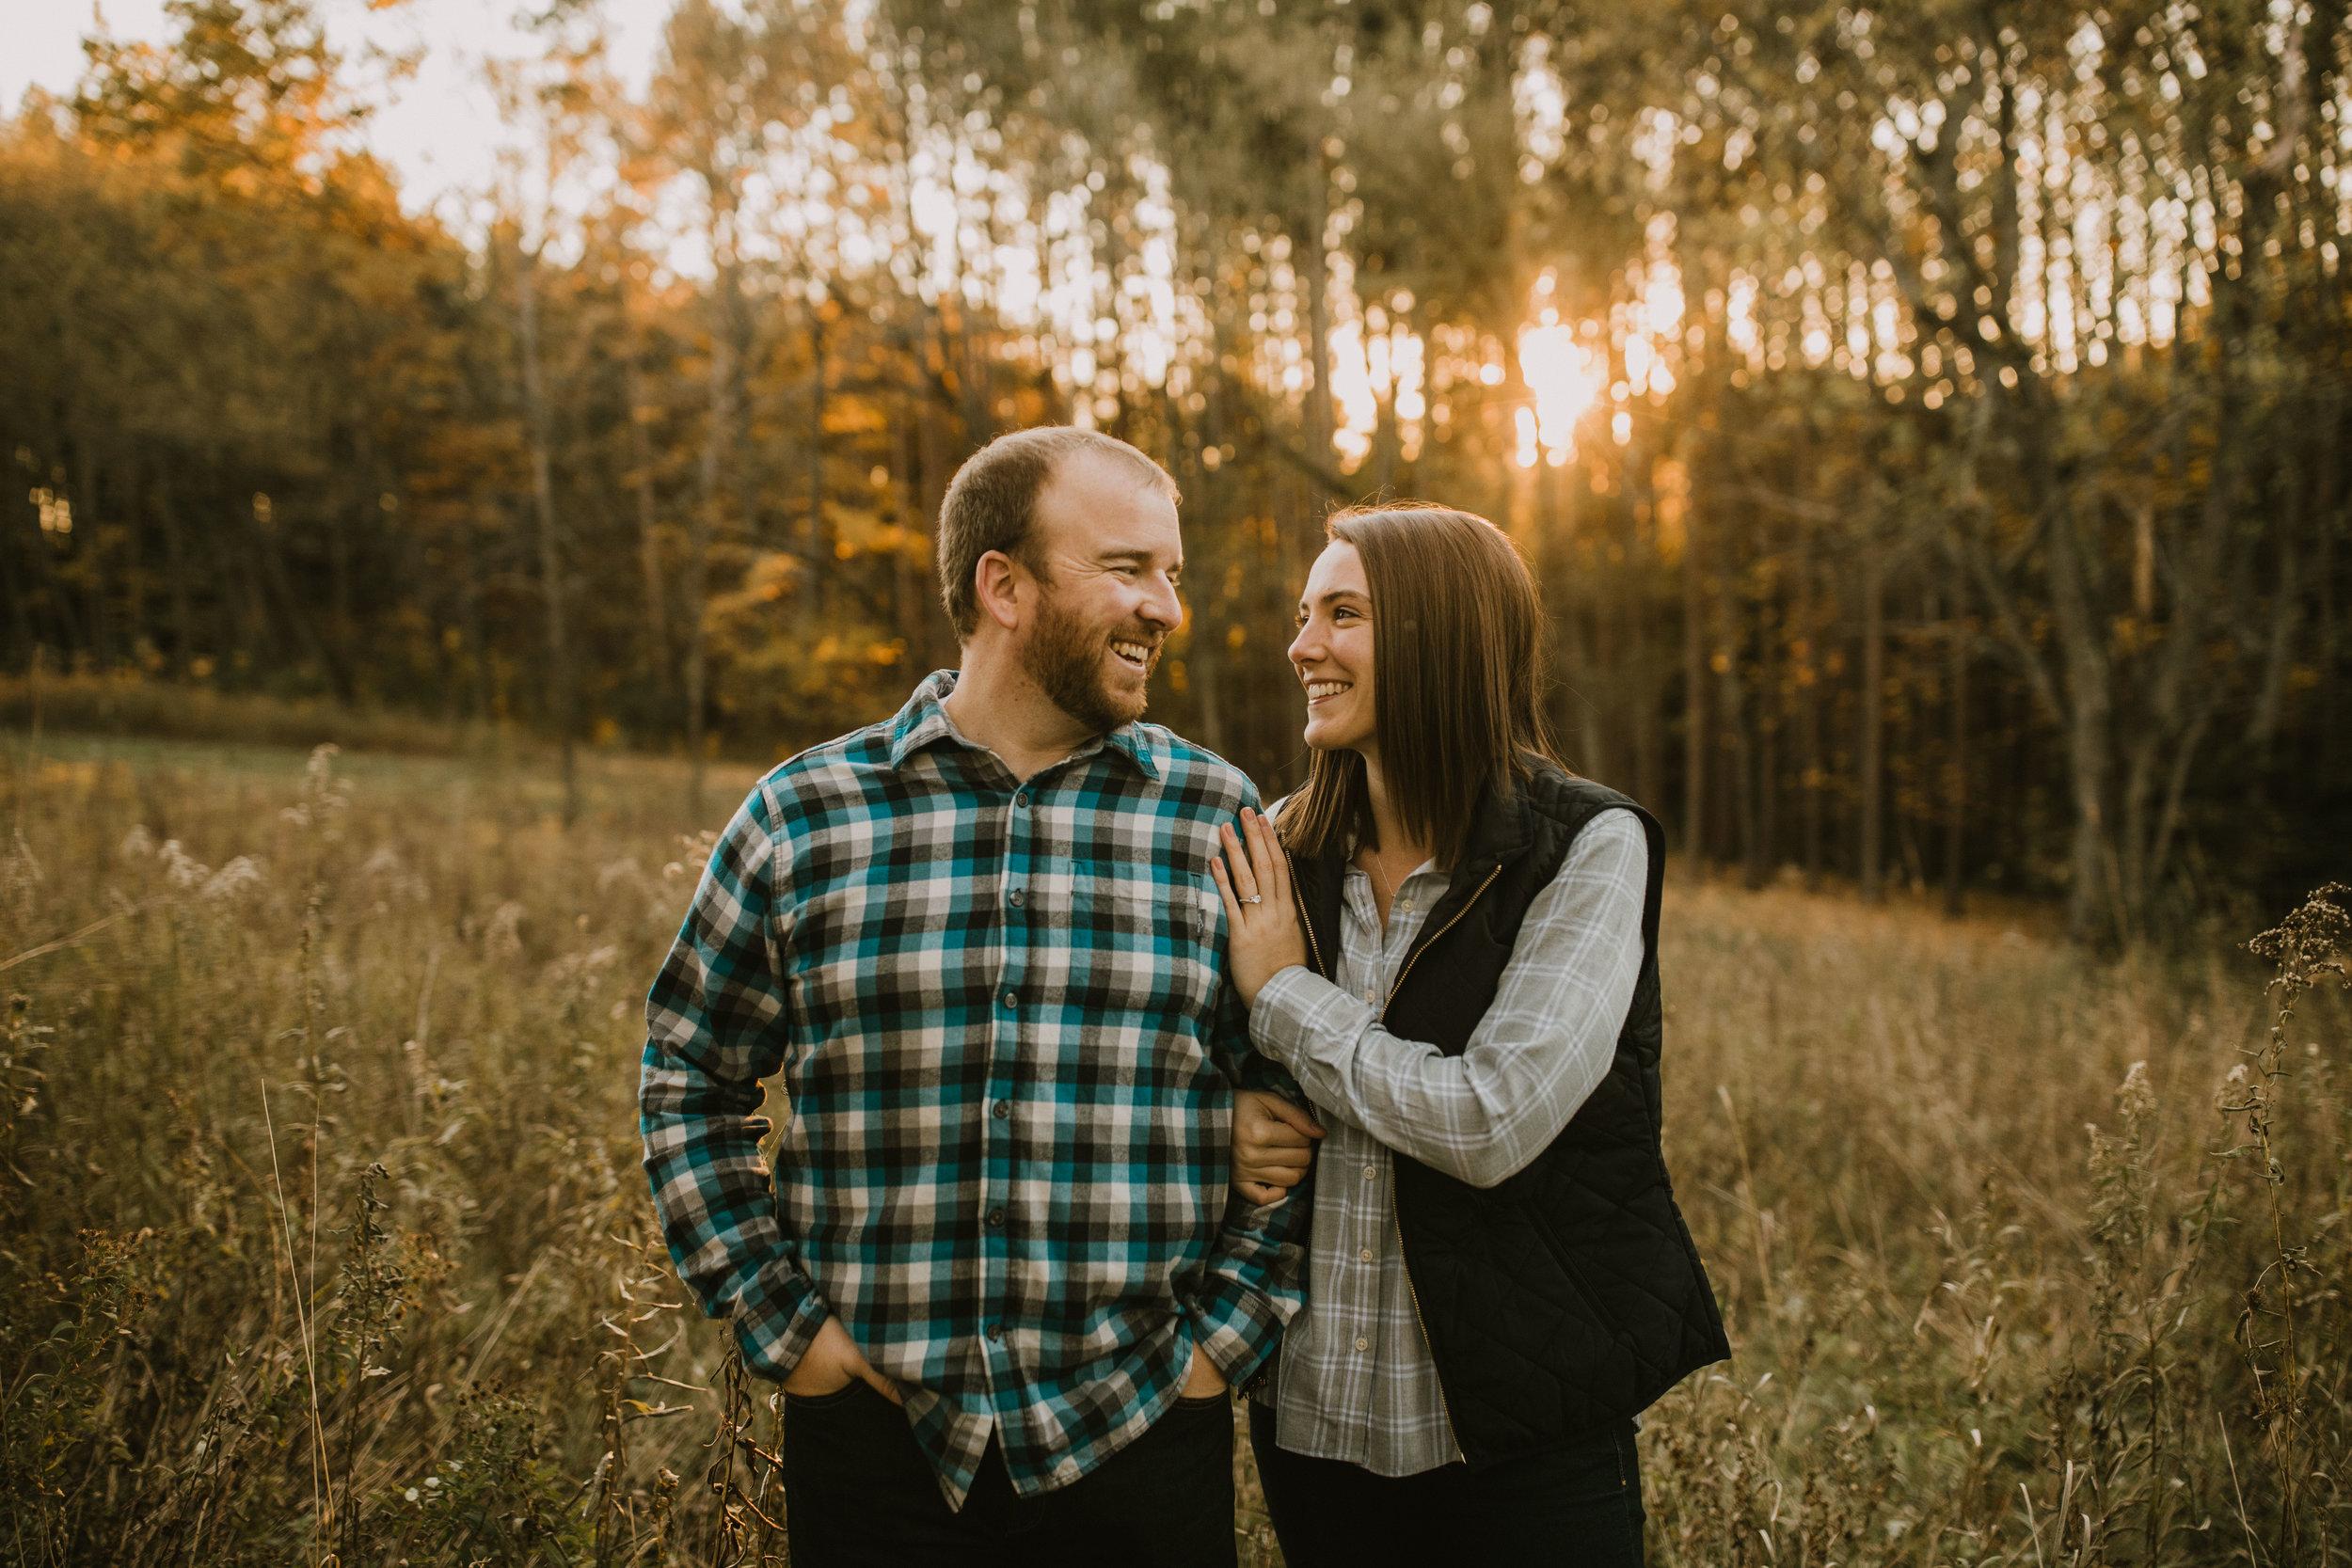 B&A-Waukesha Engagement Photographer-42.jpg